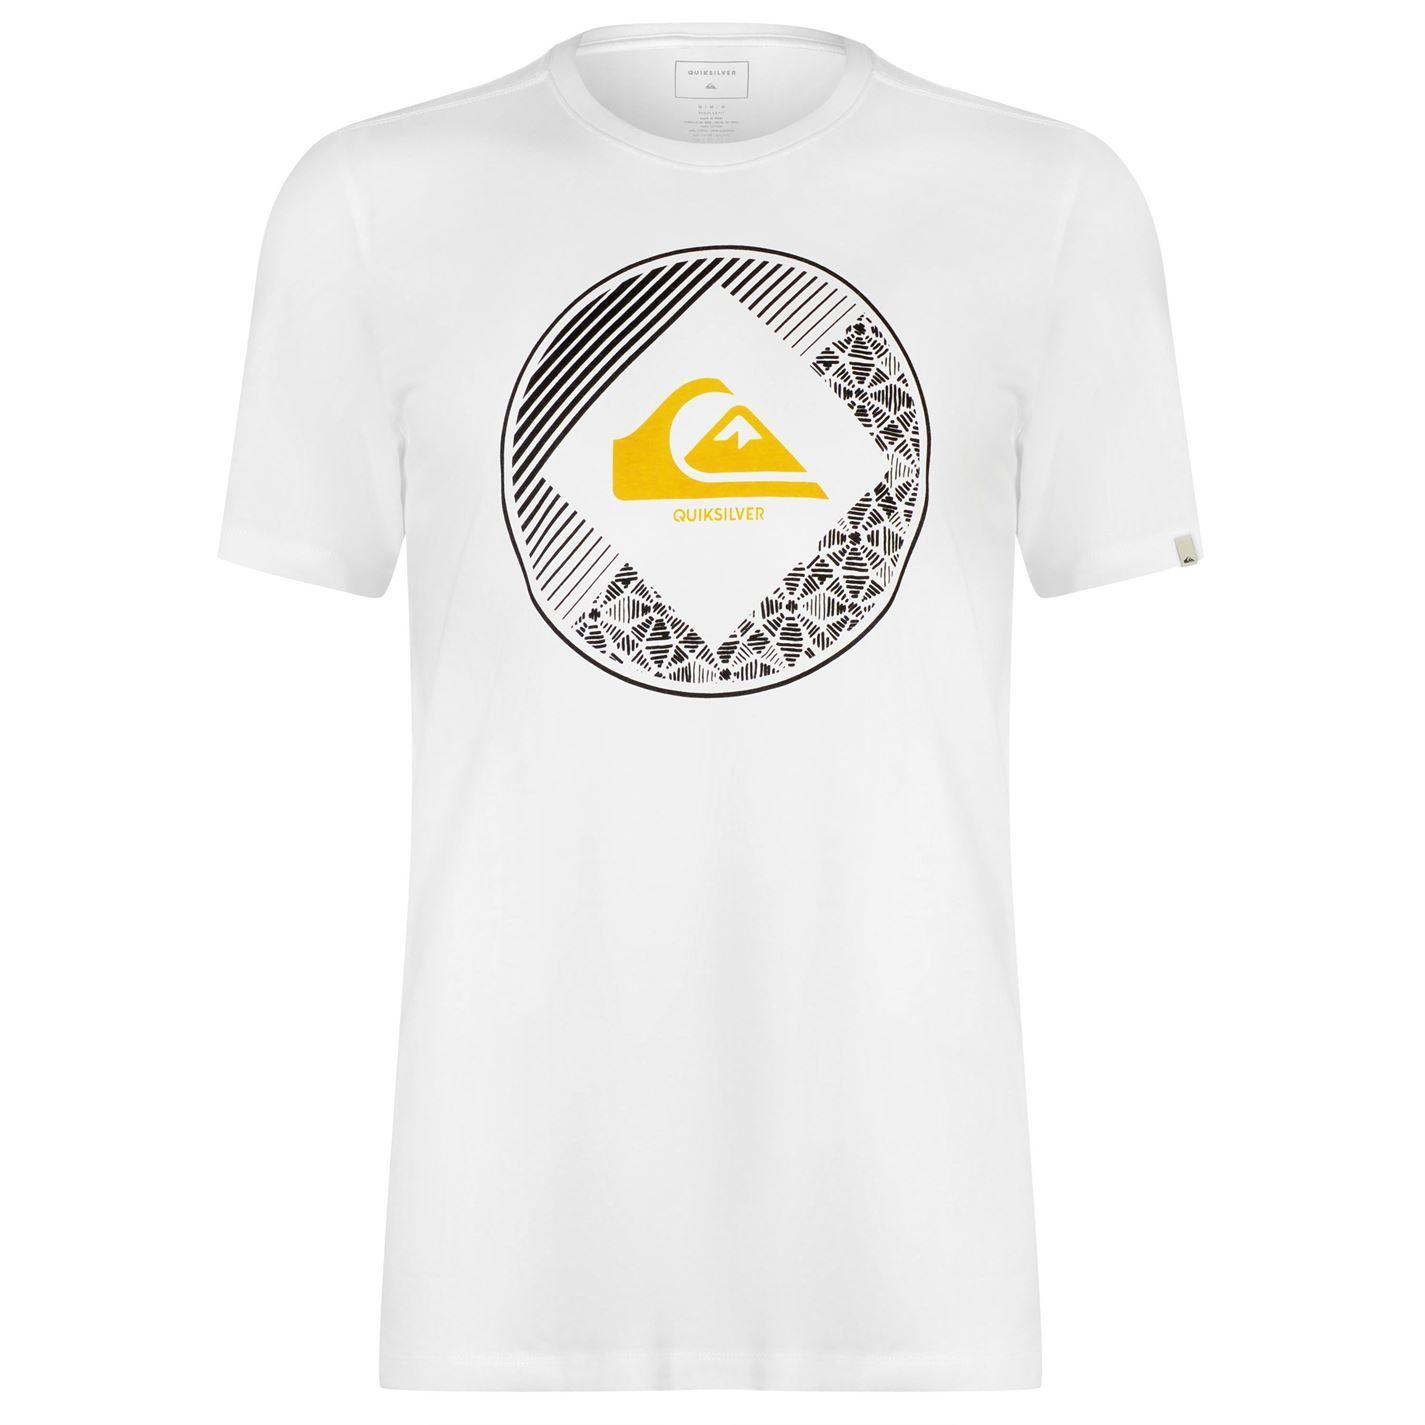 Quiksilver-Diamond-Logo-T-Shirt-Mens-Top-Tee-Shirt-White-Small thumbnail 7